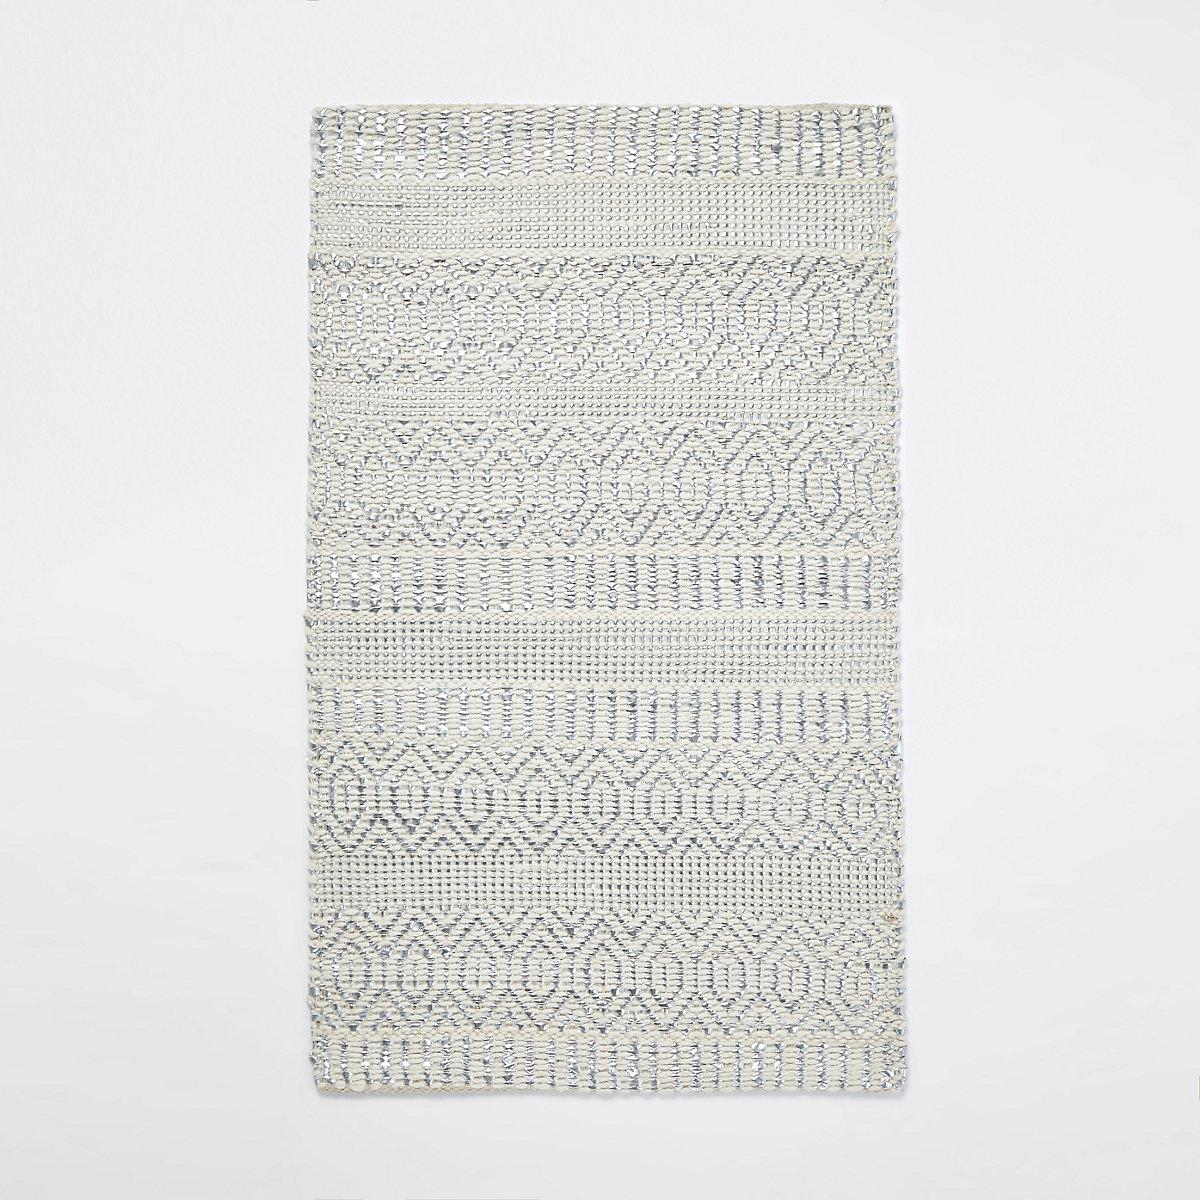 Cream geometric woven rug